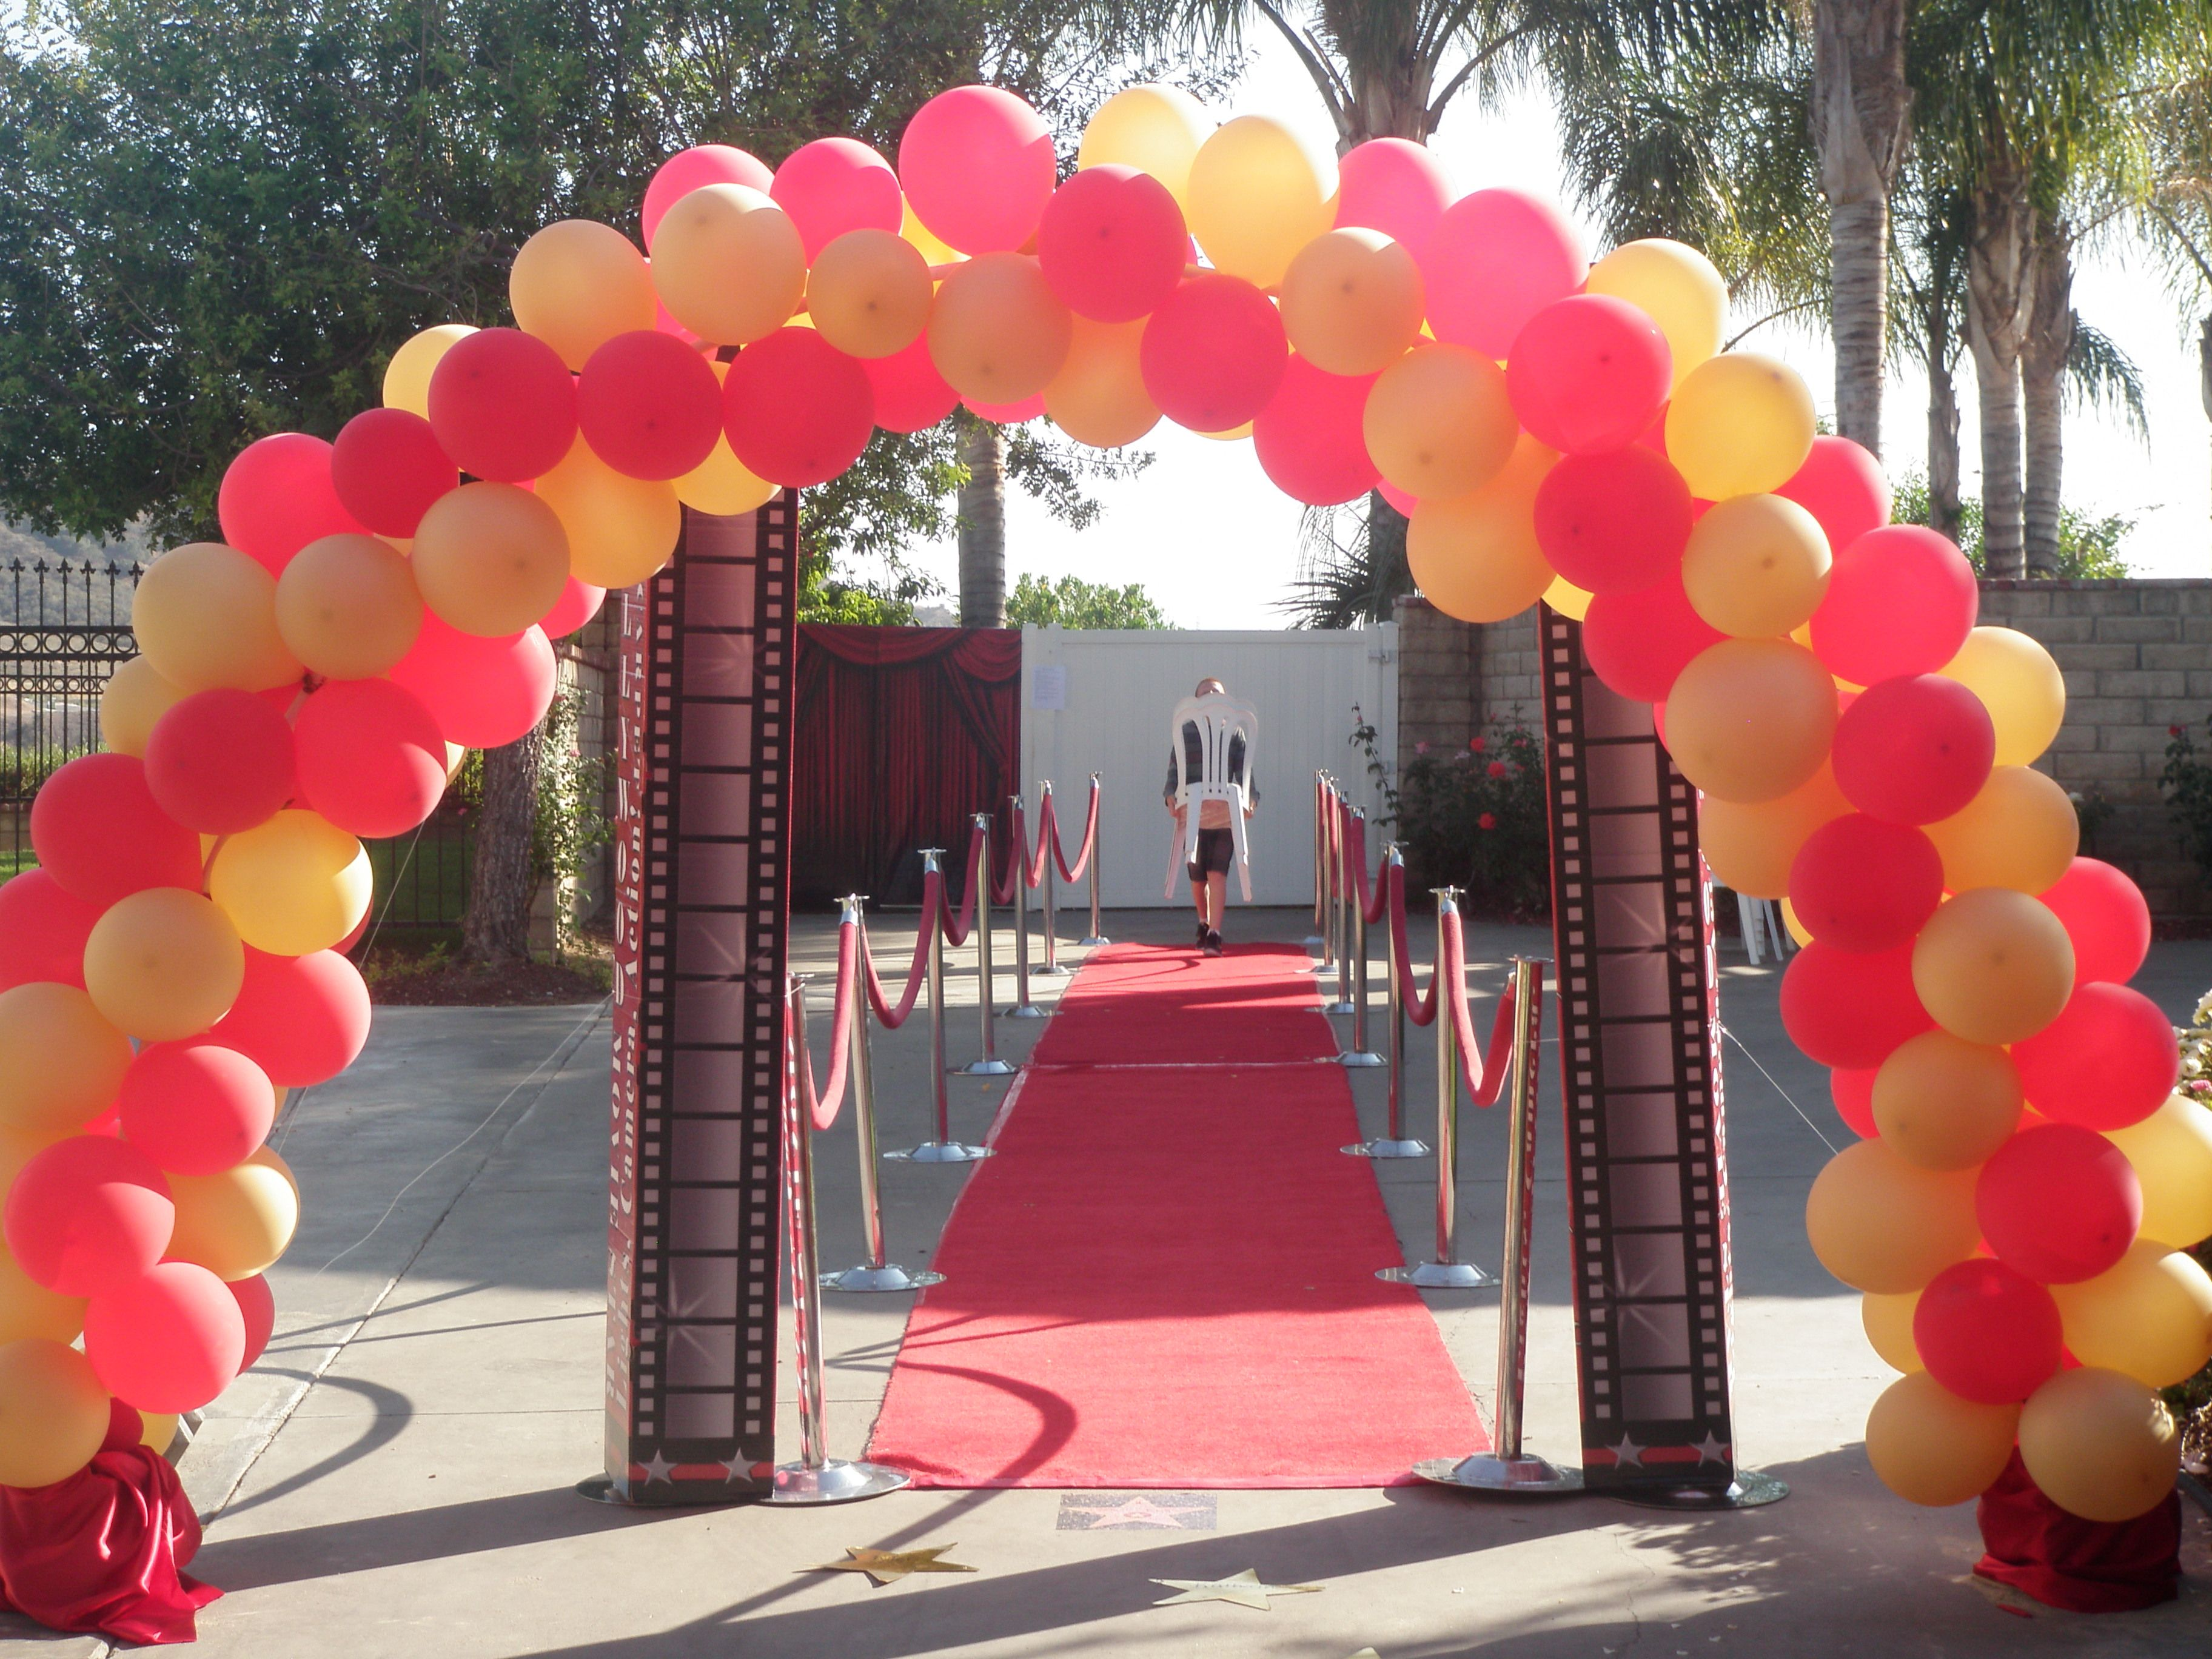 red carpet graduation party red carpet party pinterest. Black Bedroom Furniture Sets. Home Design Ideas